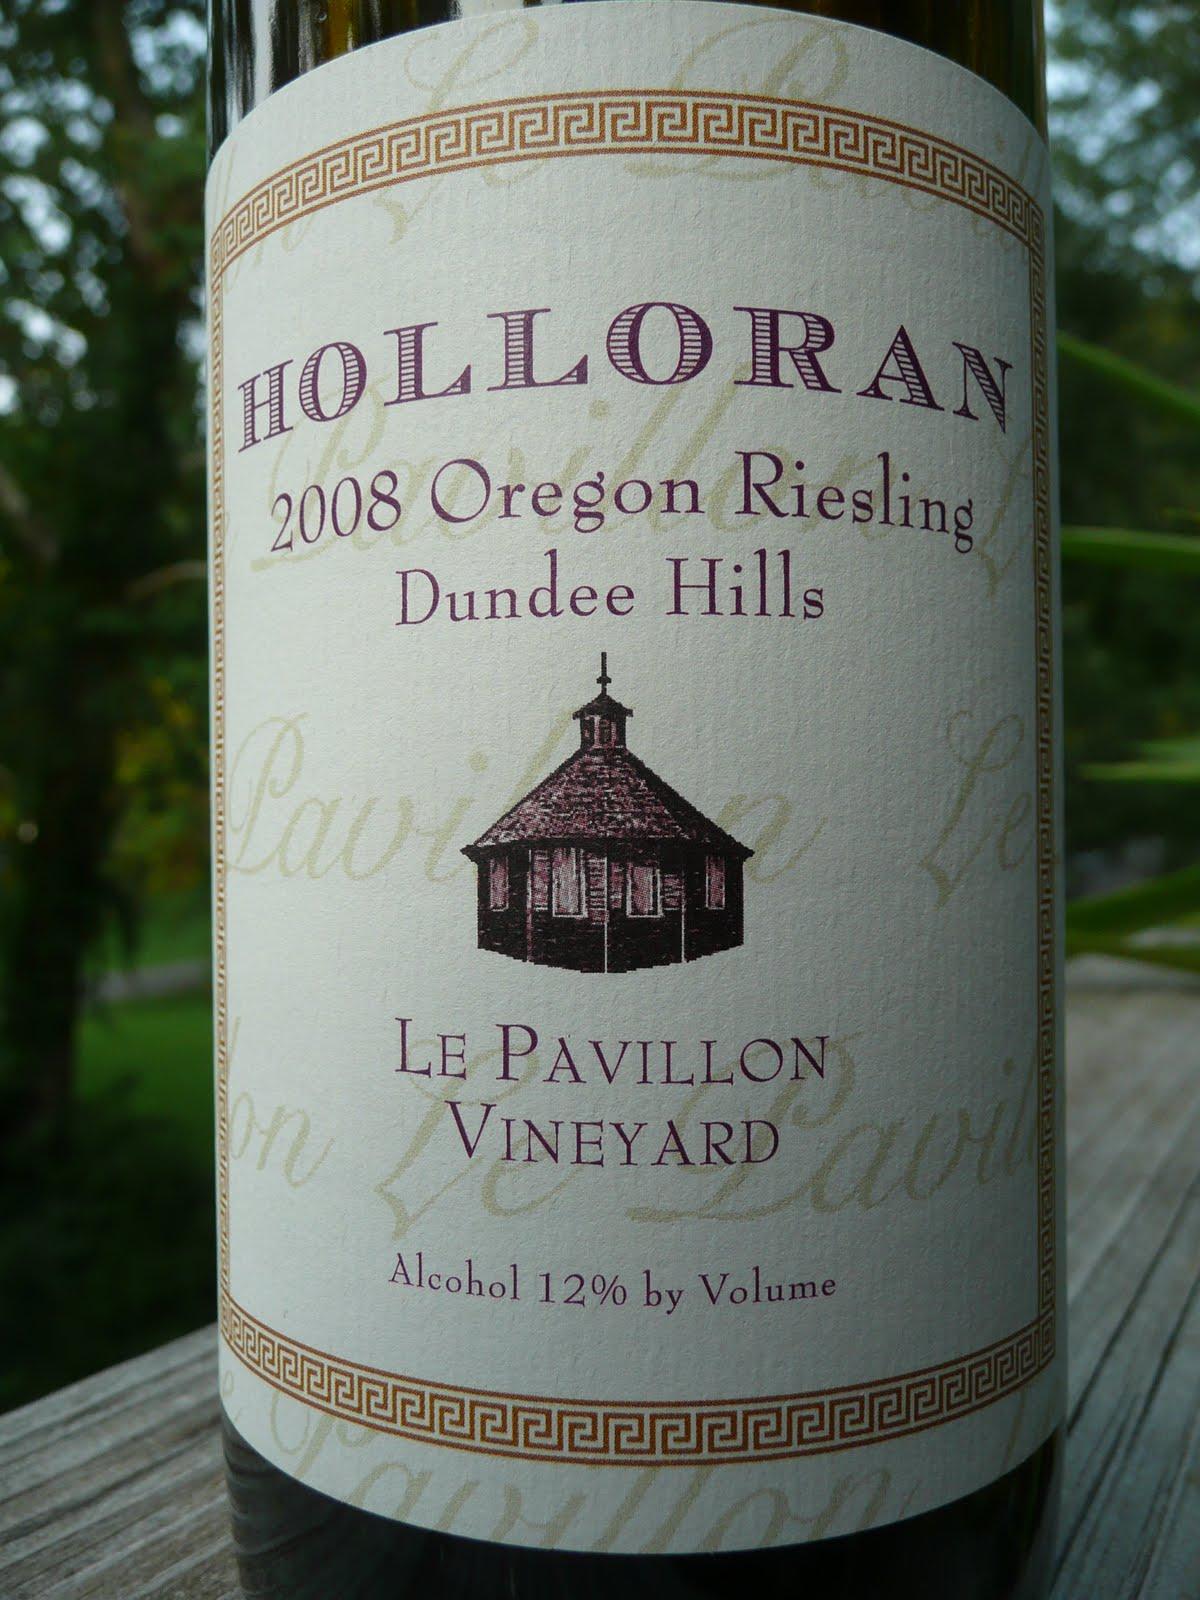 schiller-wine: The Jay Somers Wines of Bill Holloran, Oregon